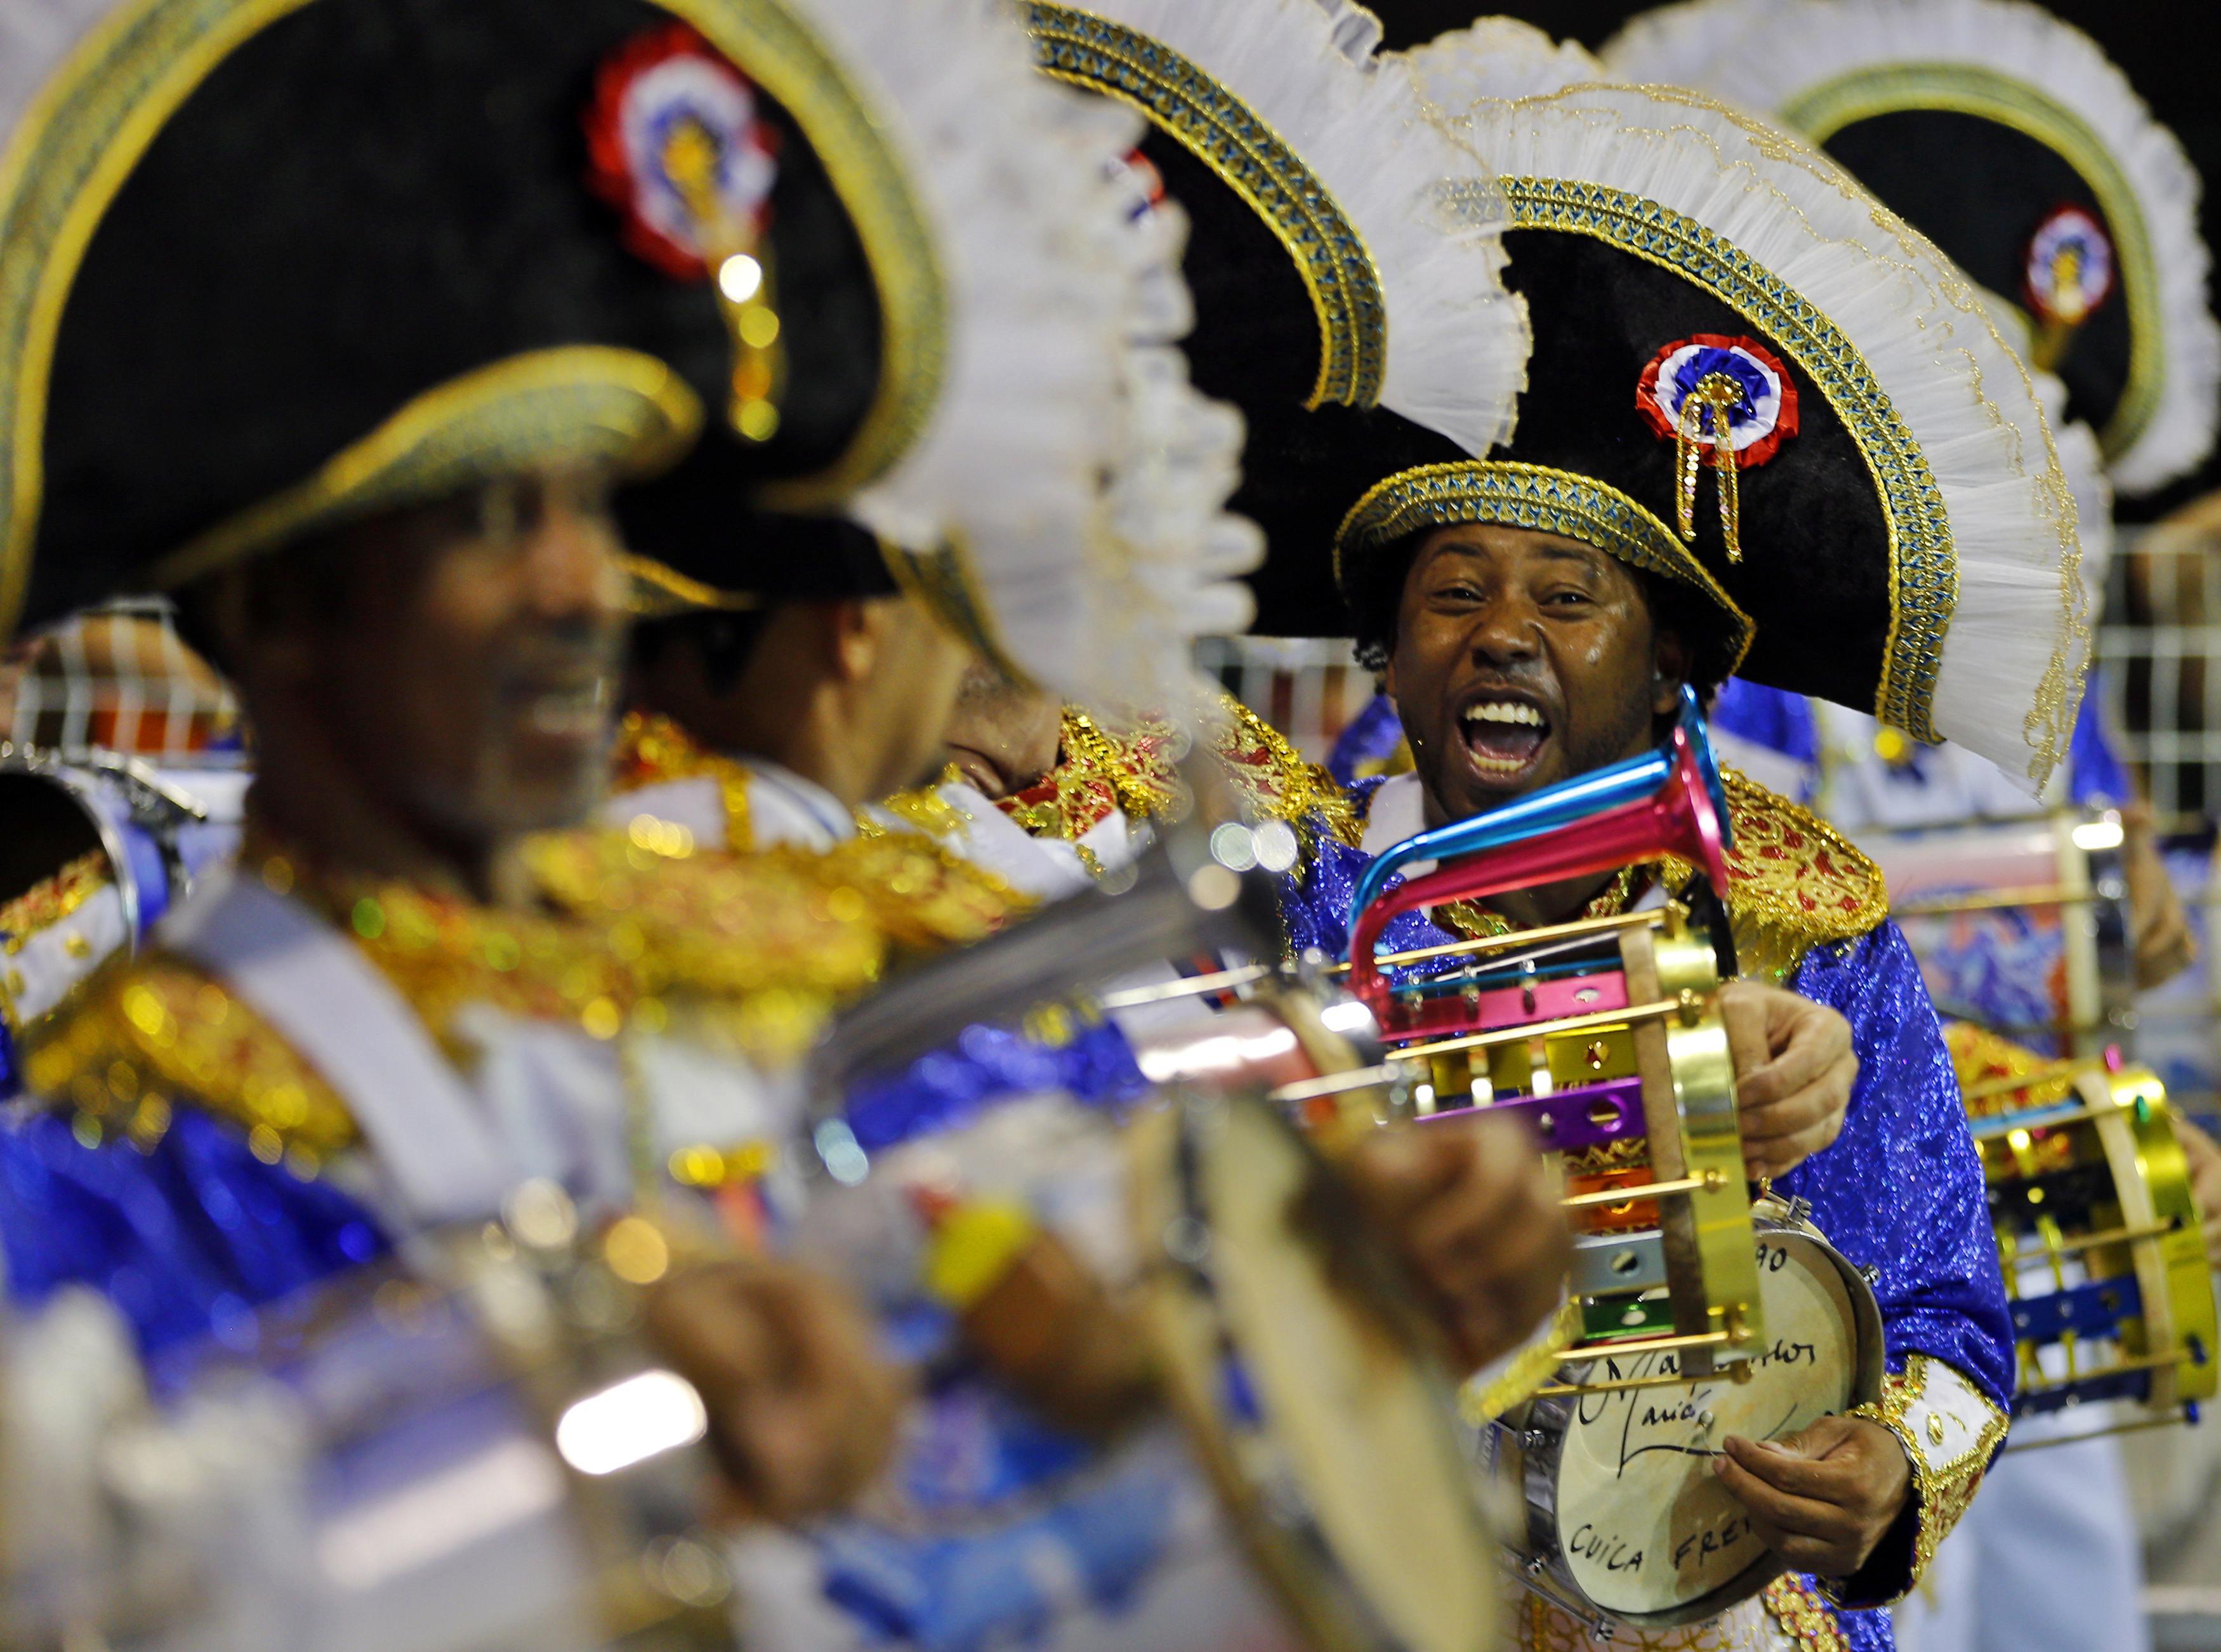 Integrantes da escola de samba Nenê de Vila Matilde durante desfile no Anhembi | Paulo Whitaker/Reuters